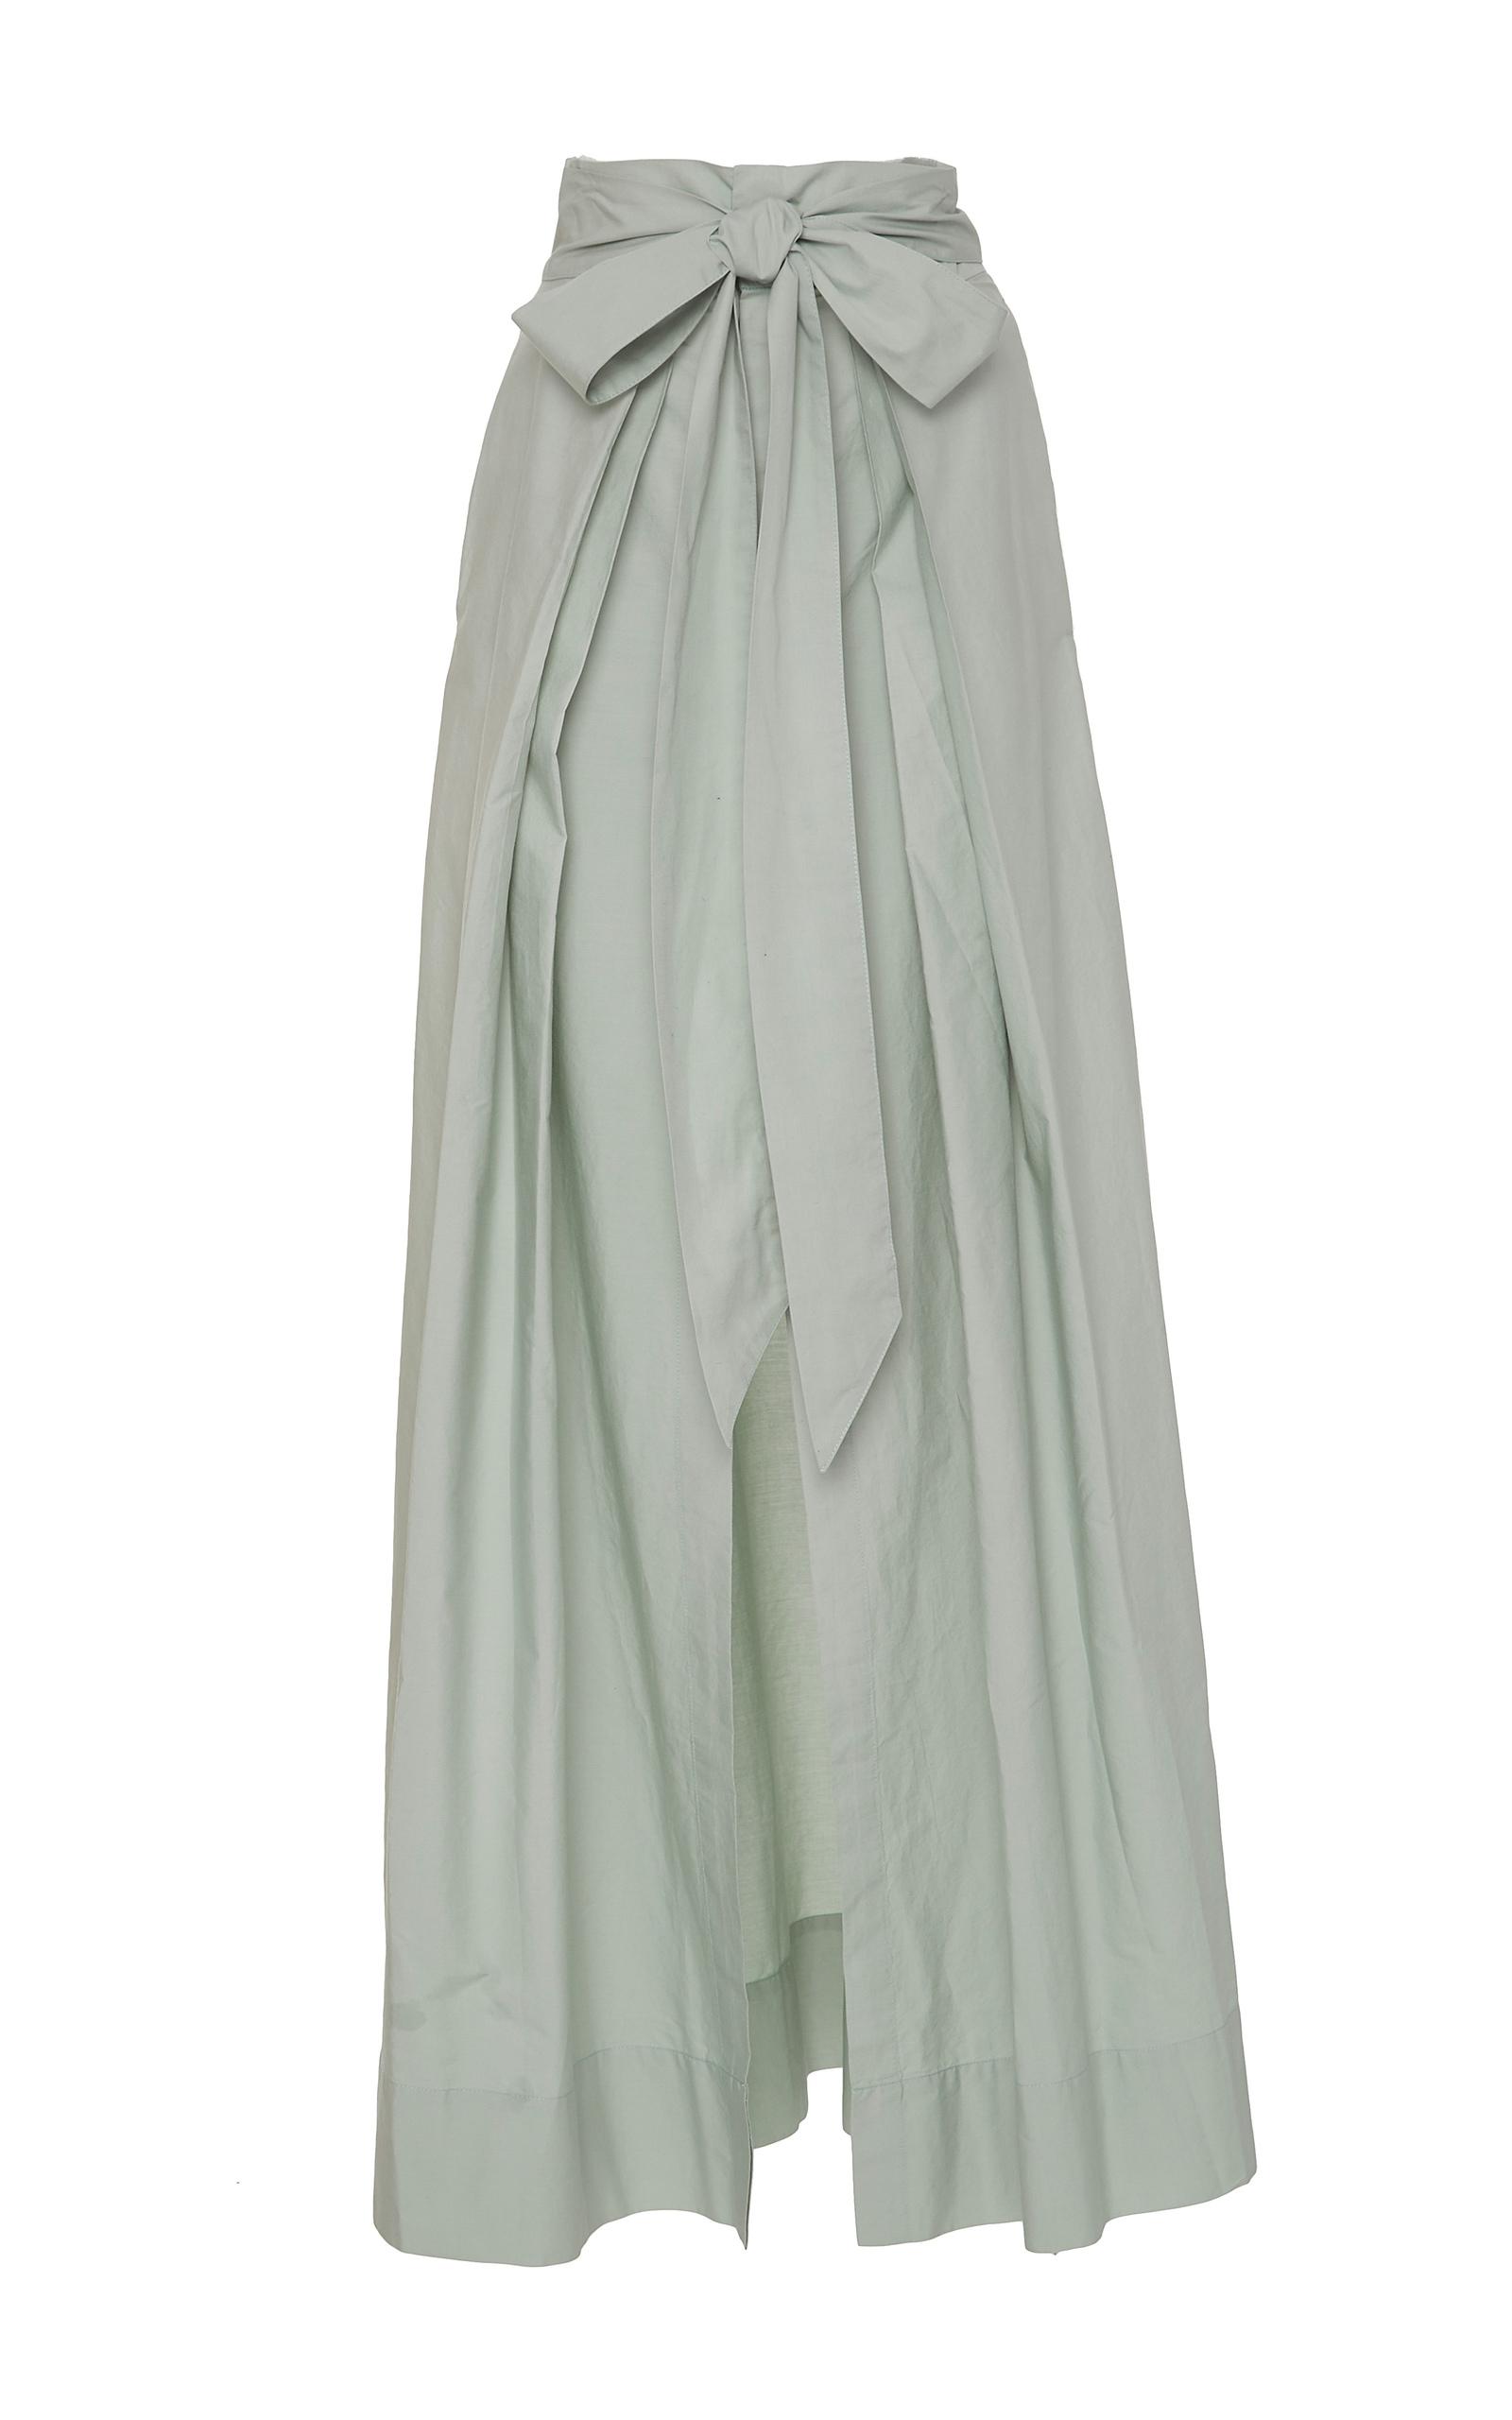 88db1115e Avedon Days Maxi Skirt by Kalita | Moda Operandi